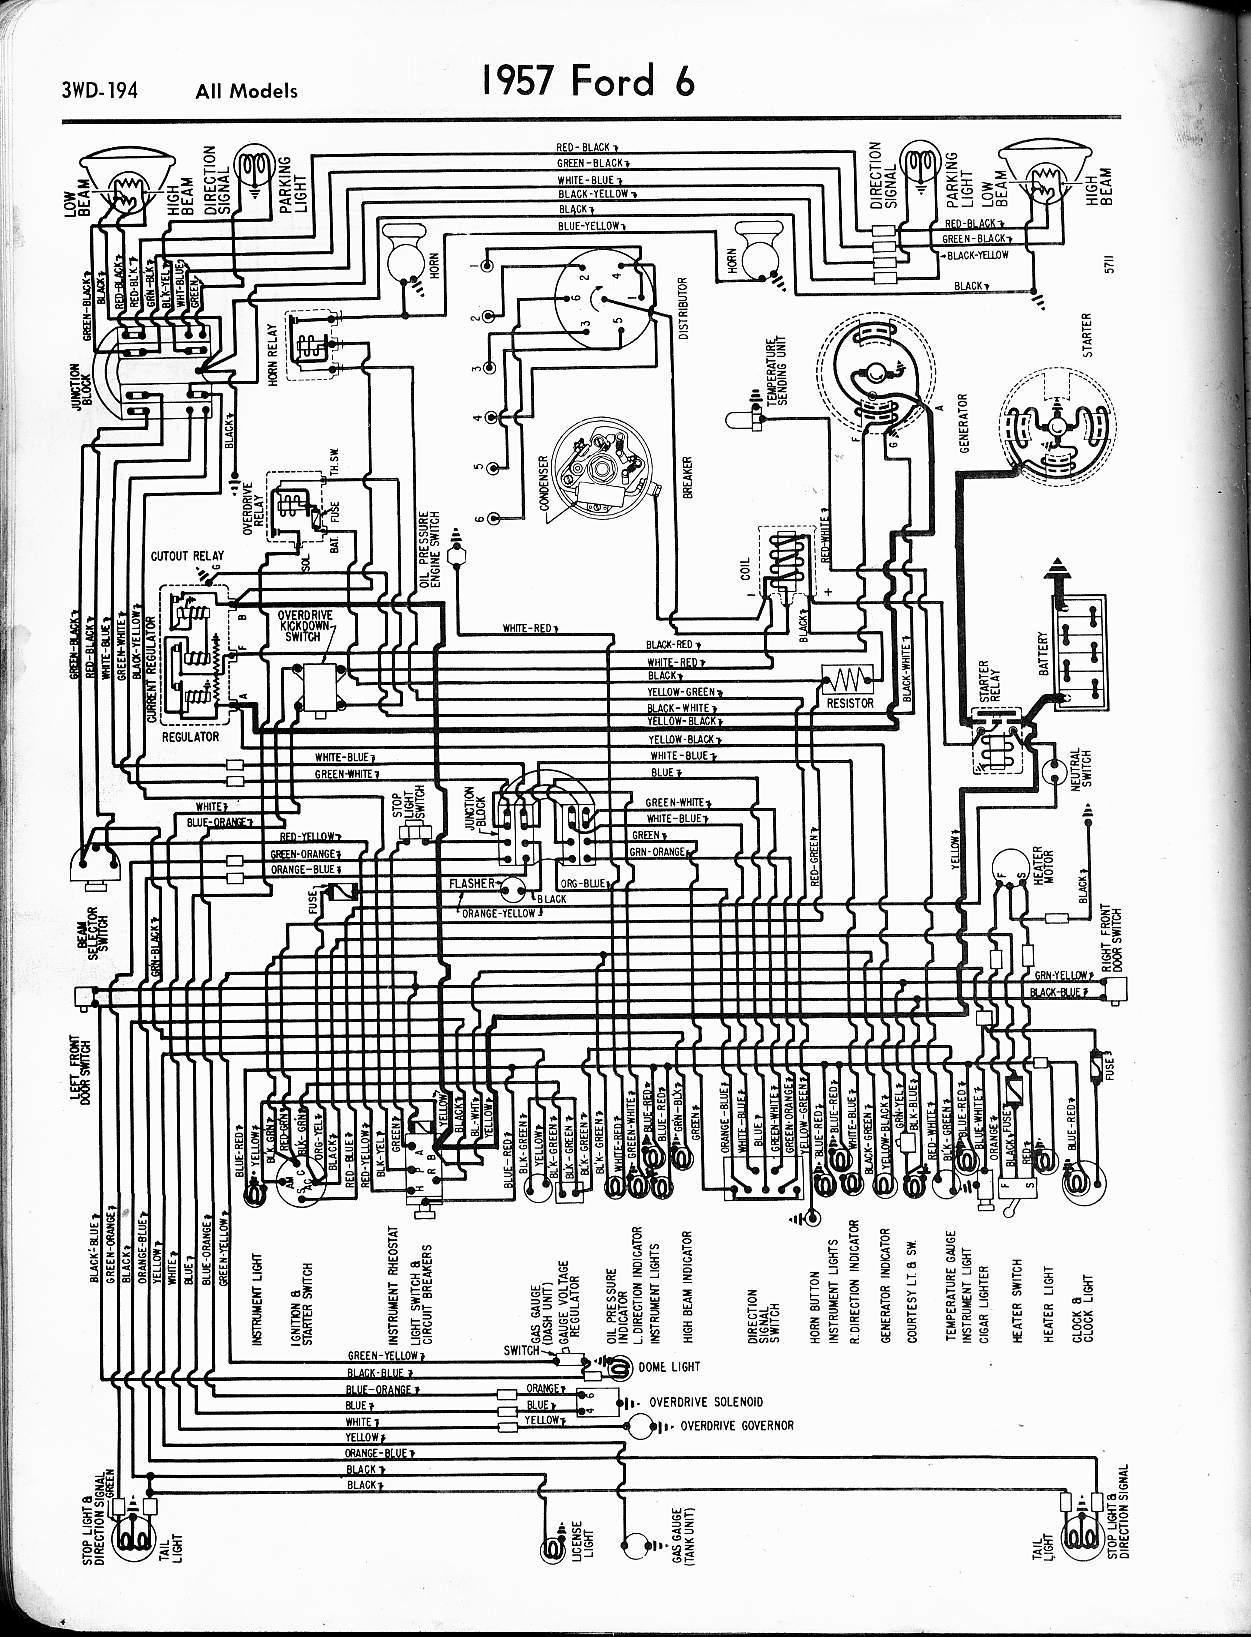 [EQHS_1162]  ED_0259] Ford Steering Column Wiring Diagrams Also Ford Steering Column  Diagram Free Diagram | 1966 Ford F100 Steering Column Wiring Diagram |  | Itive Usly Gue45 Mohammedshrine Librar Wiring 101